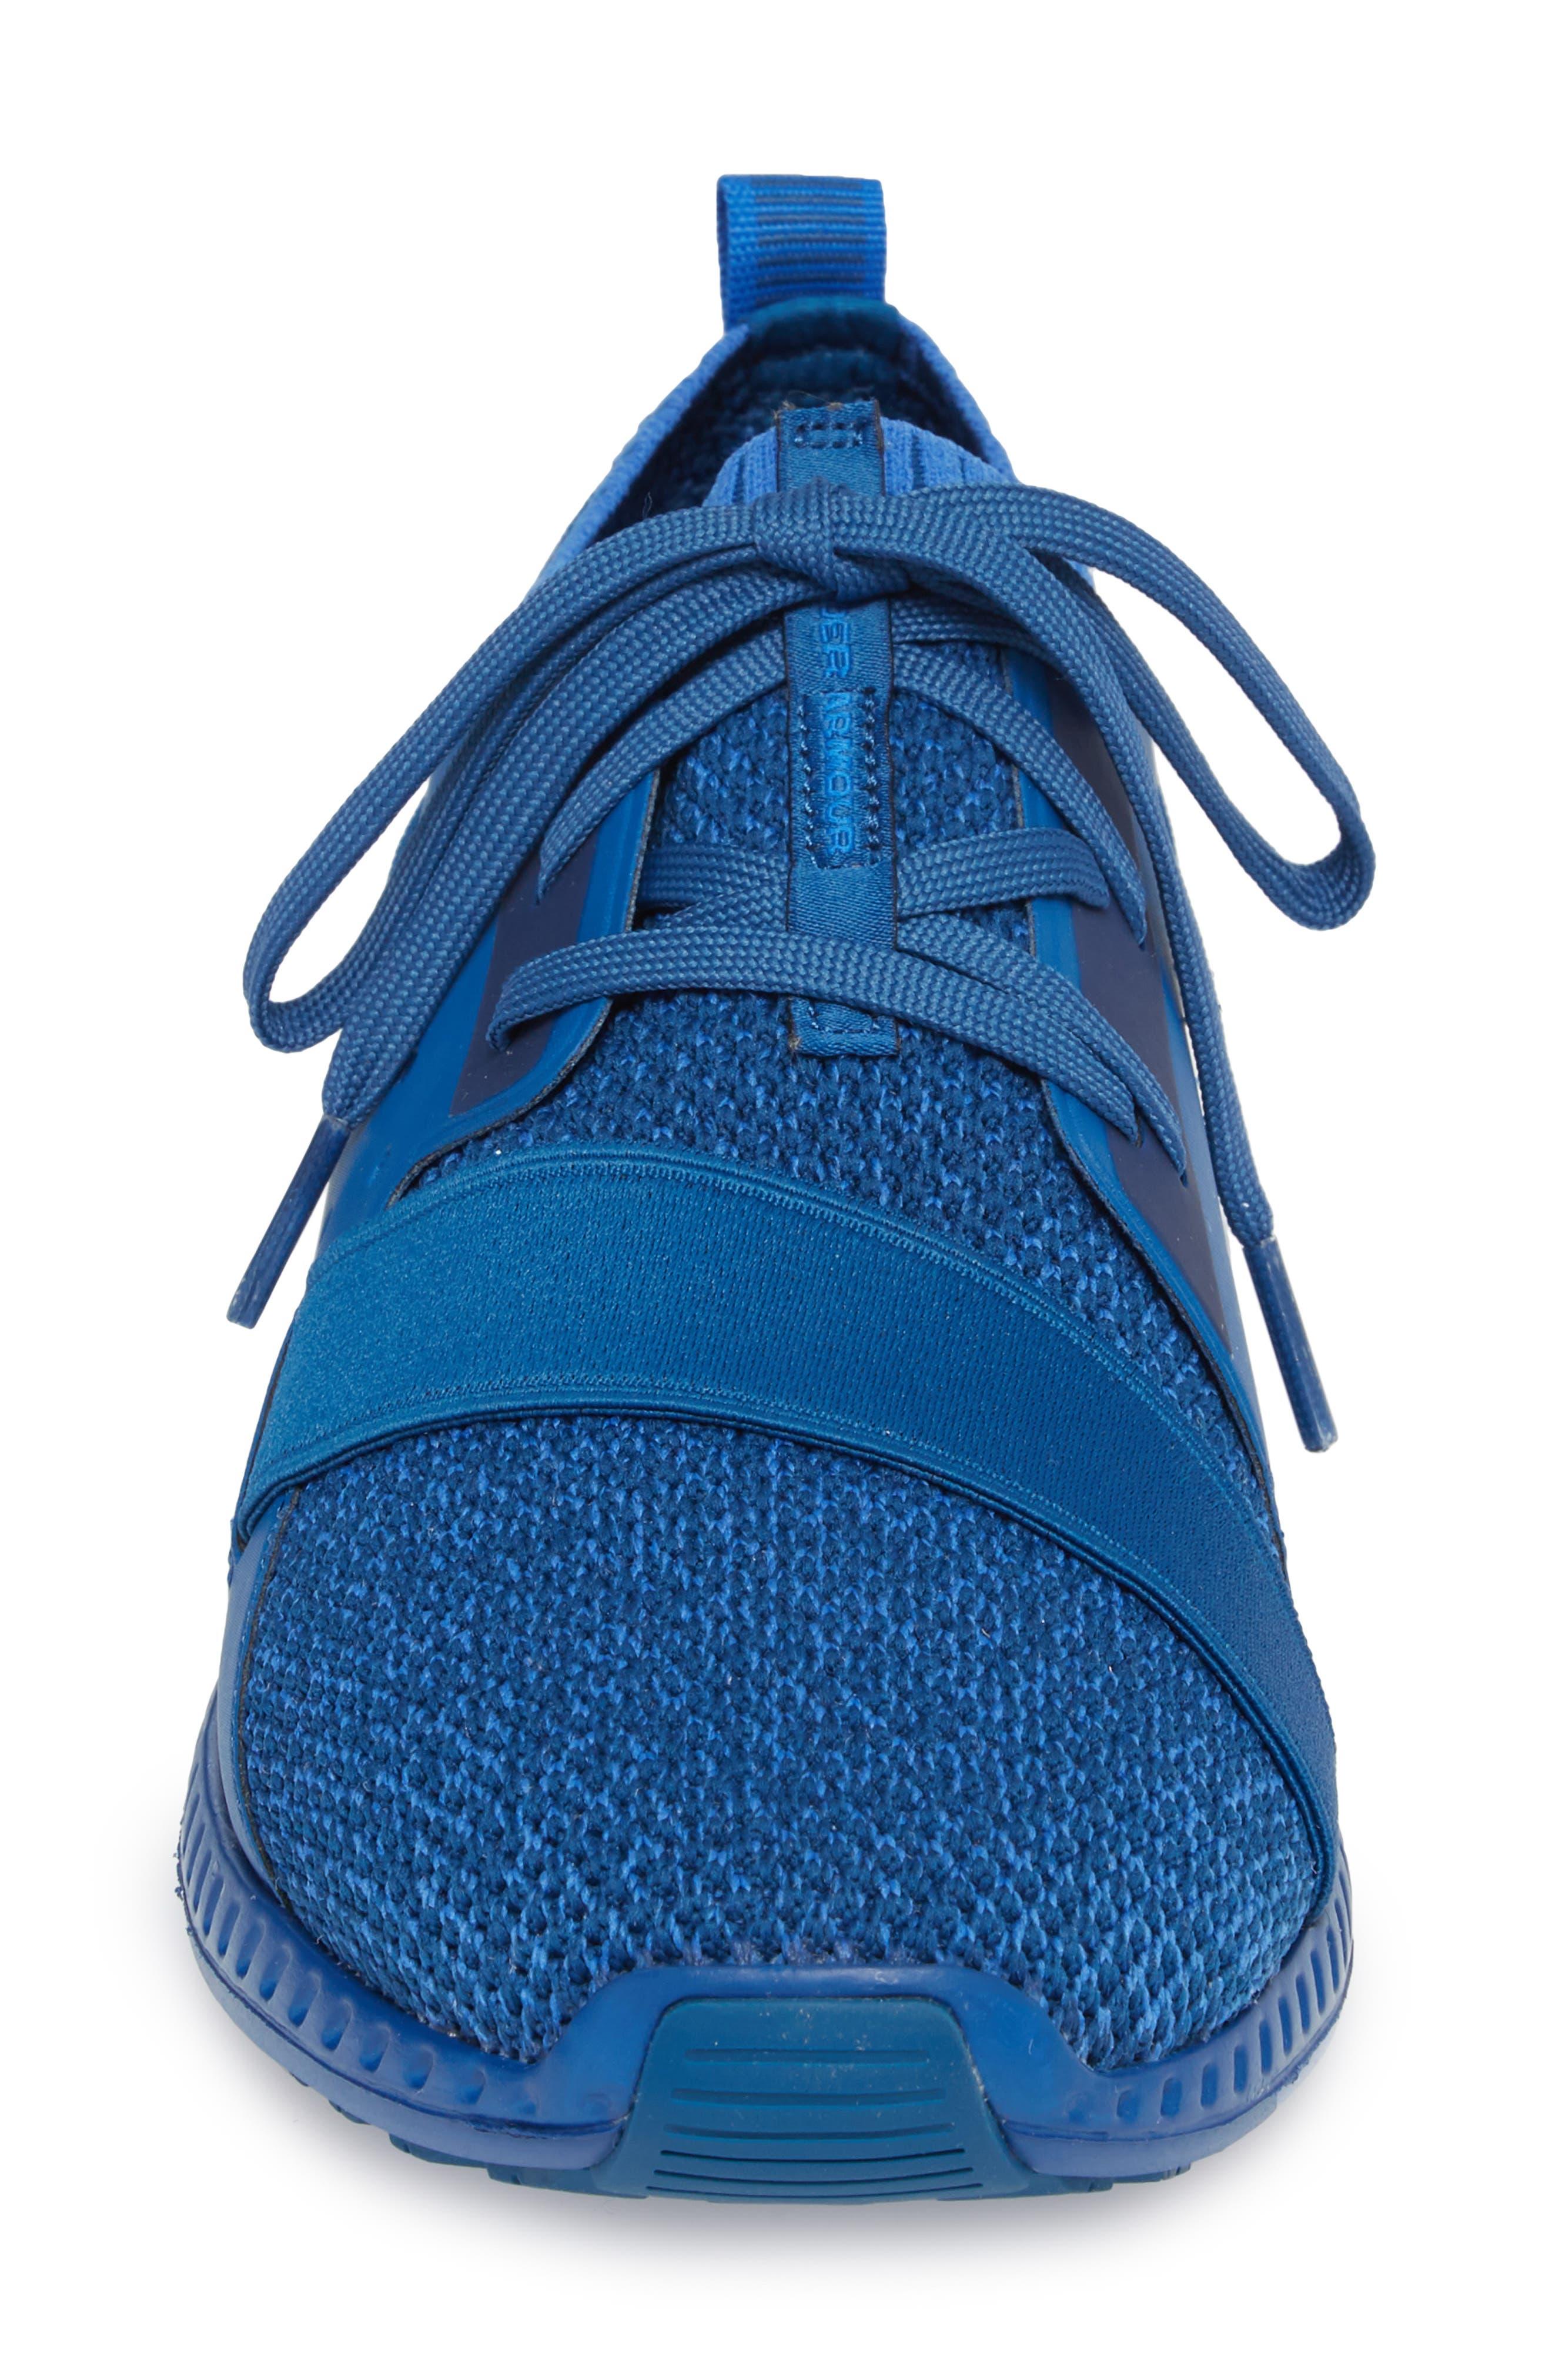 Threadborne Shift Sneaker,                             Alternate thumbnail 4, color,                             BLUE / MEDITERRANEAN